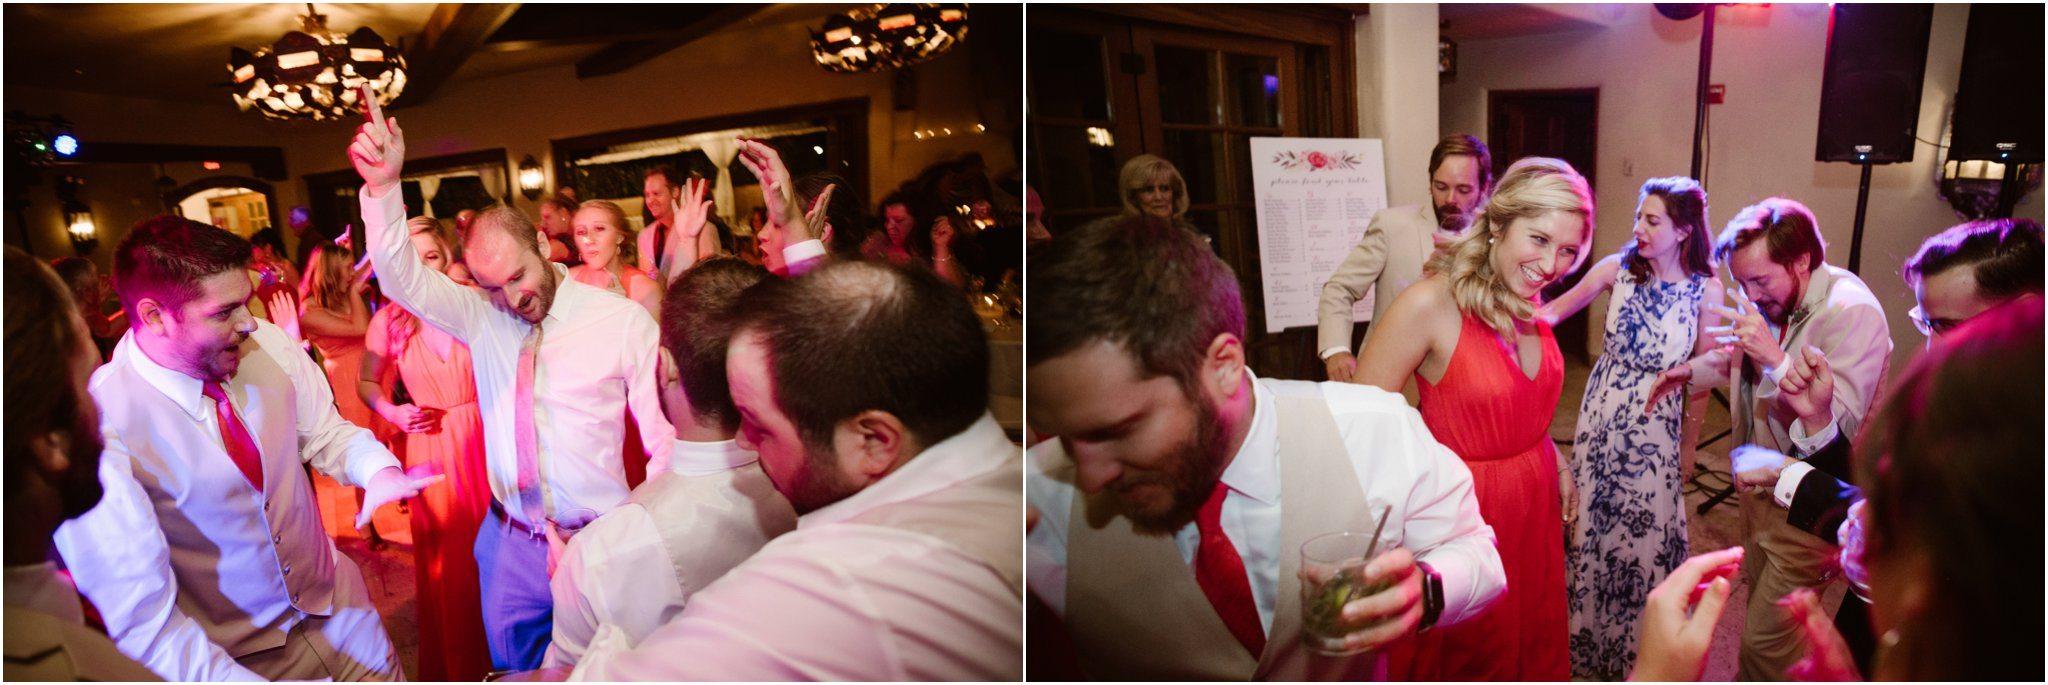 0088albuquerque-wedding-photographer_-santa-fe-wedding-photographer_-southwest-wedding-photography_-blue-rose-studio